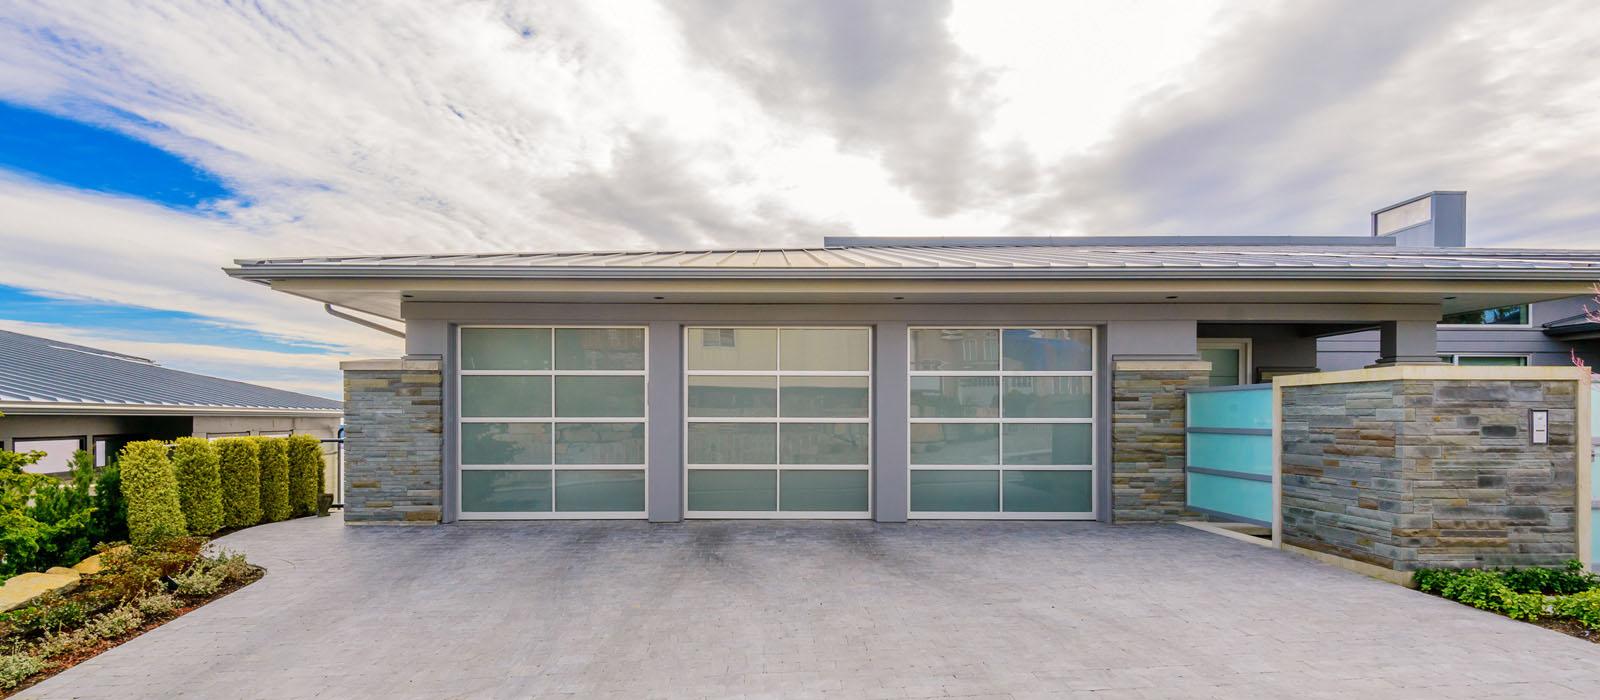 garage door repair near century city california 90024